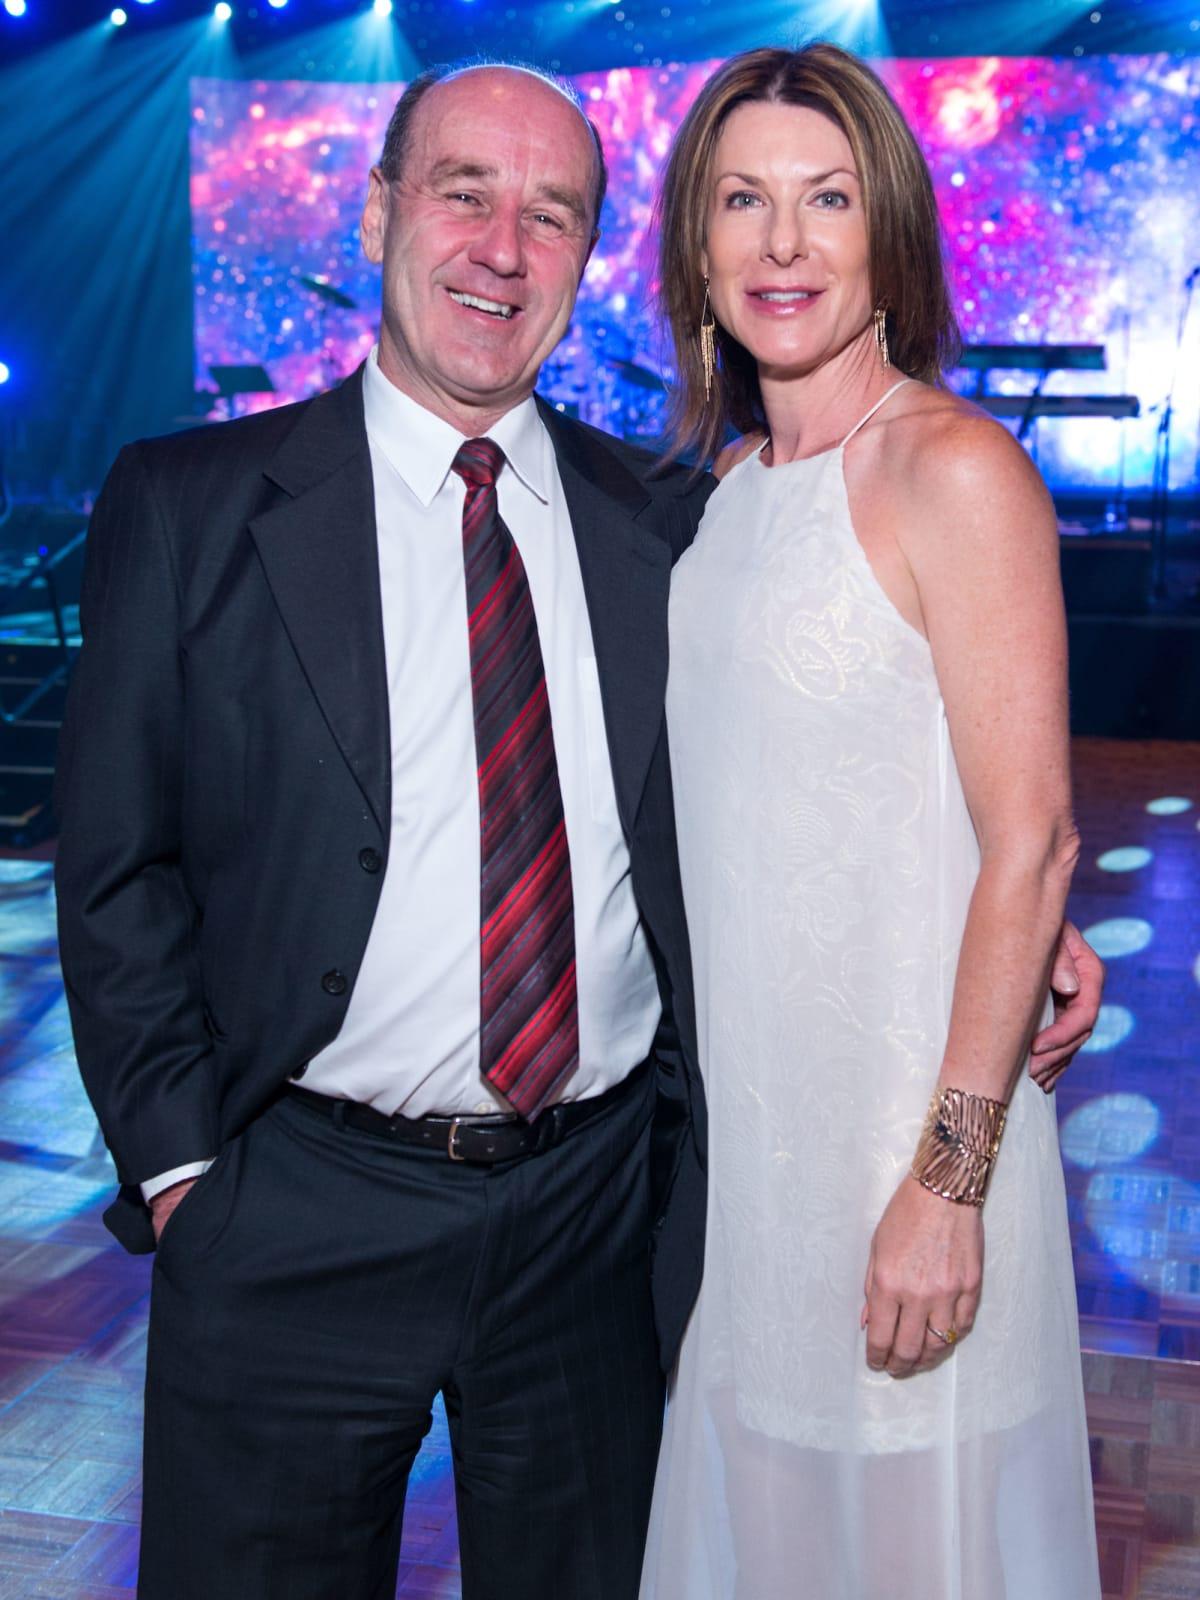 Houston, Space Center Houston Galaxy Gala, April 2017, Anthony Alessi, Ann Parks Stallings